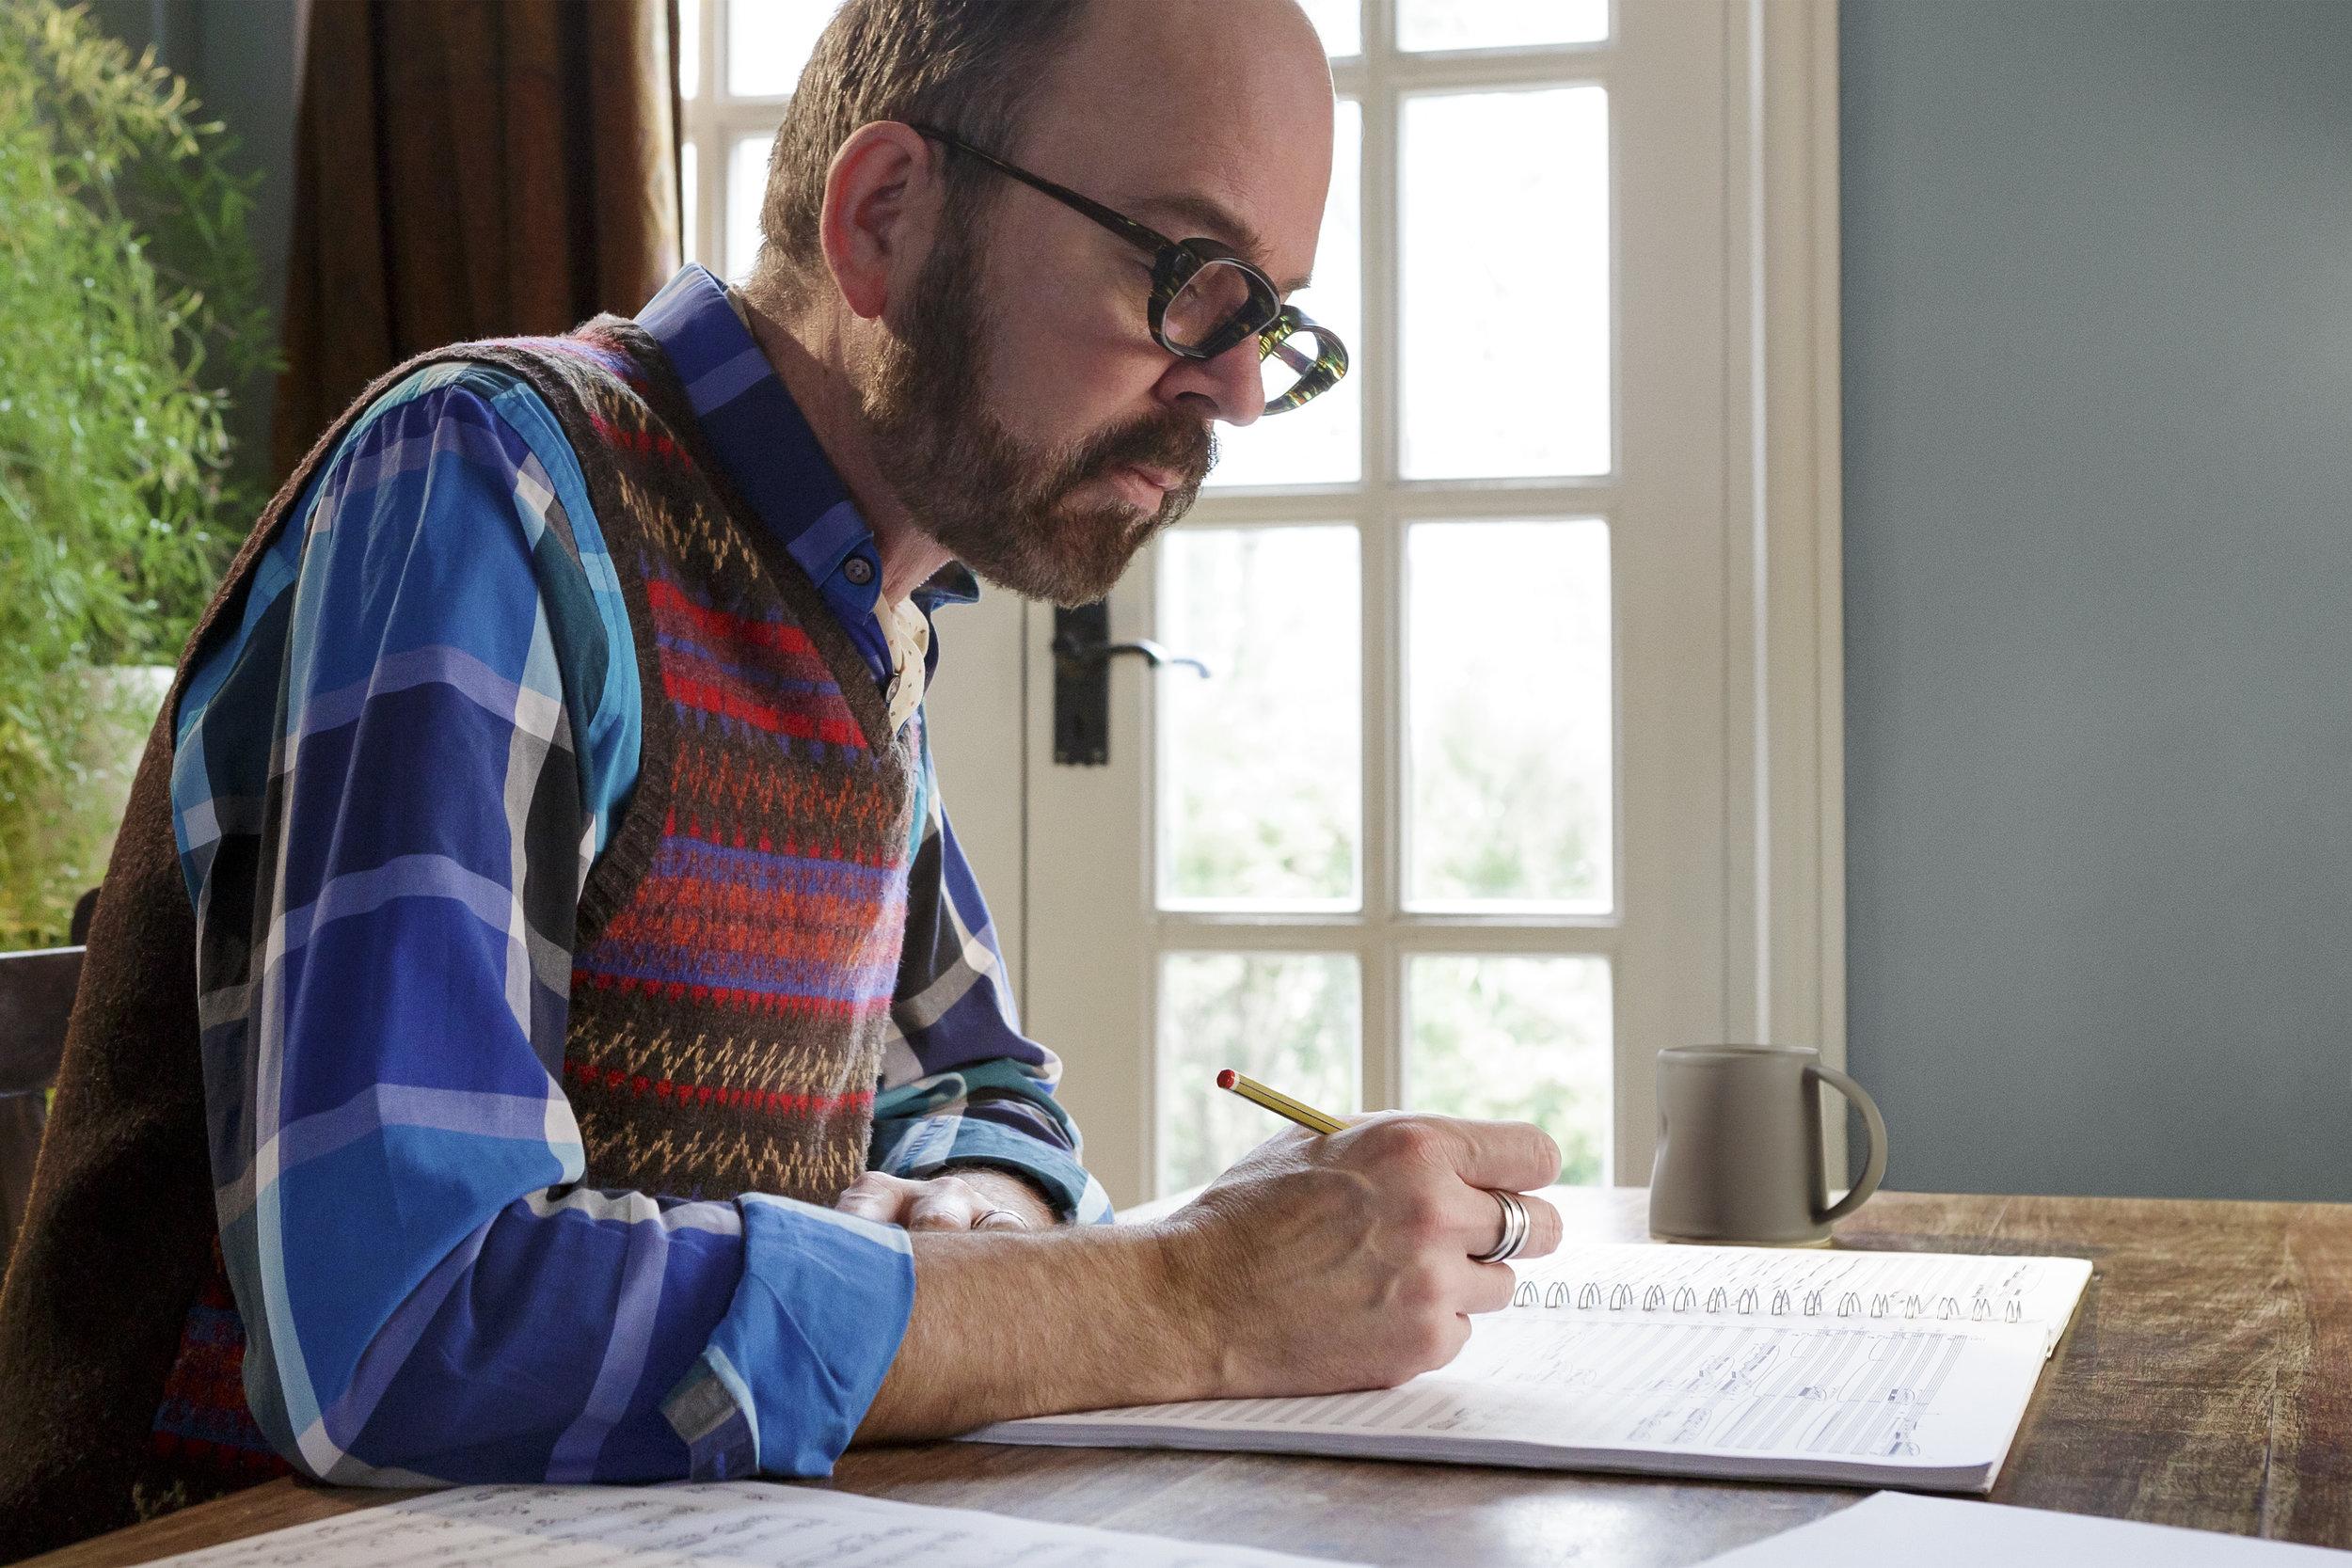 Paul Goodey-Avedisyan Oboe Composer Educator